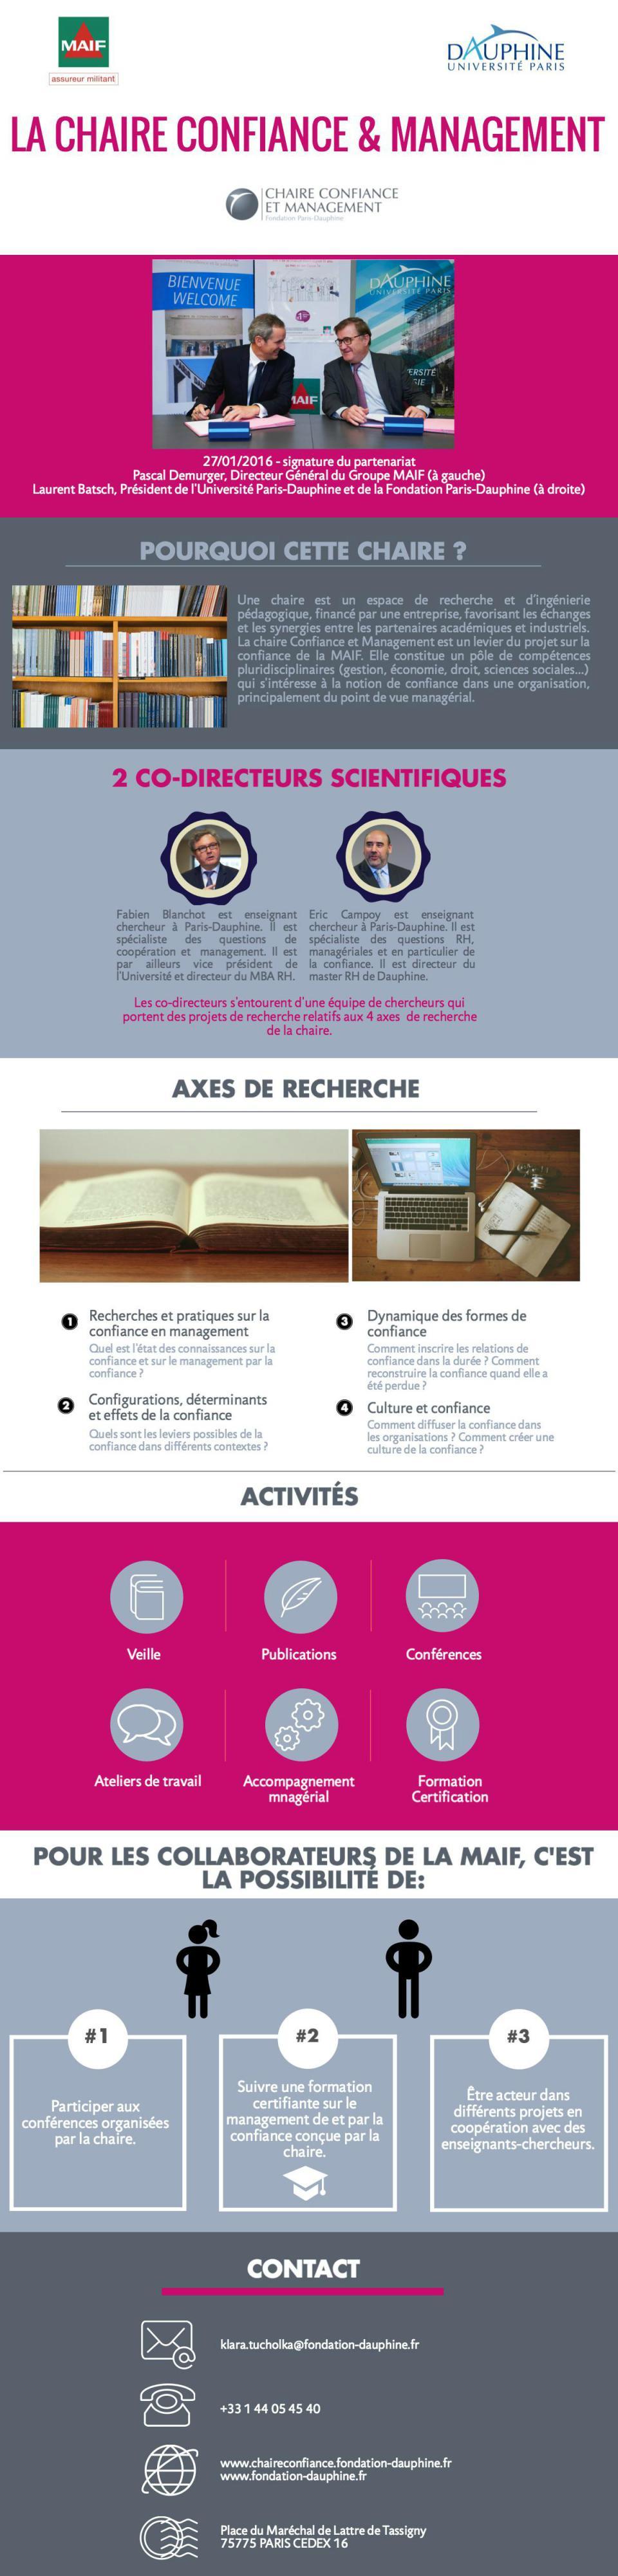 infographie_6.jpg